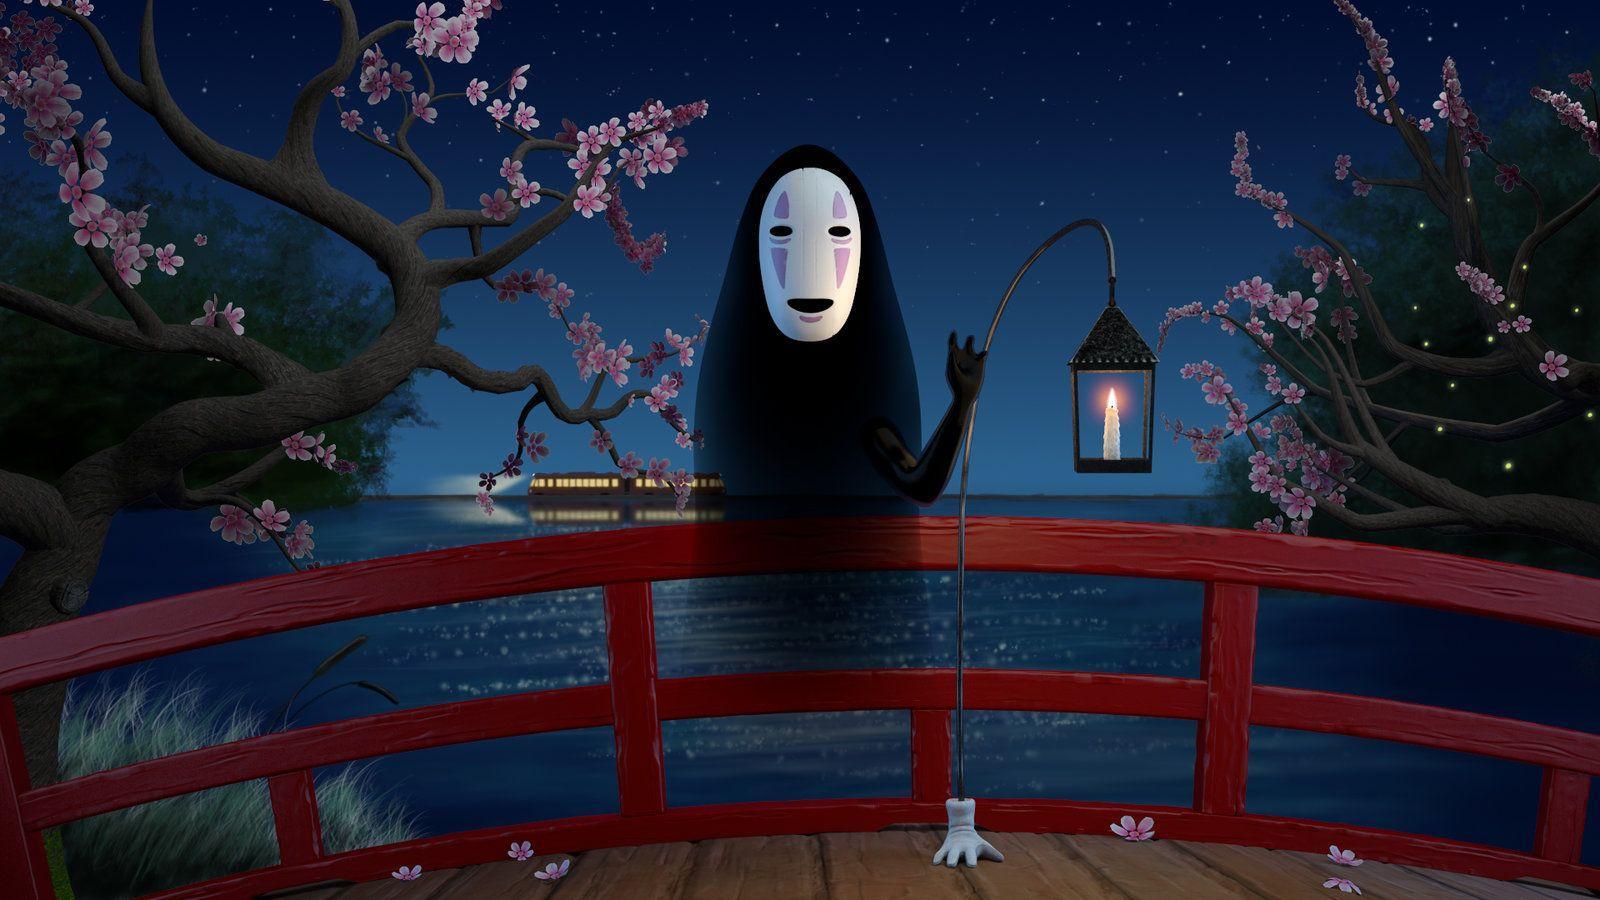 Kaonashi Wallpapers Top Free Kaonashi Backgrounds Wallpaperaccess